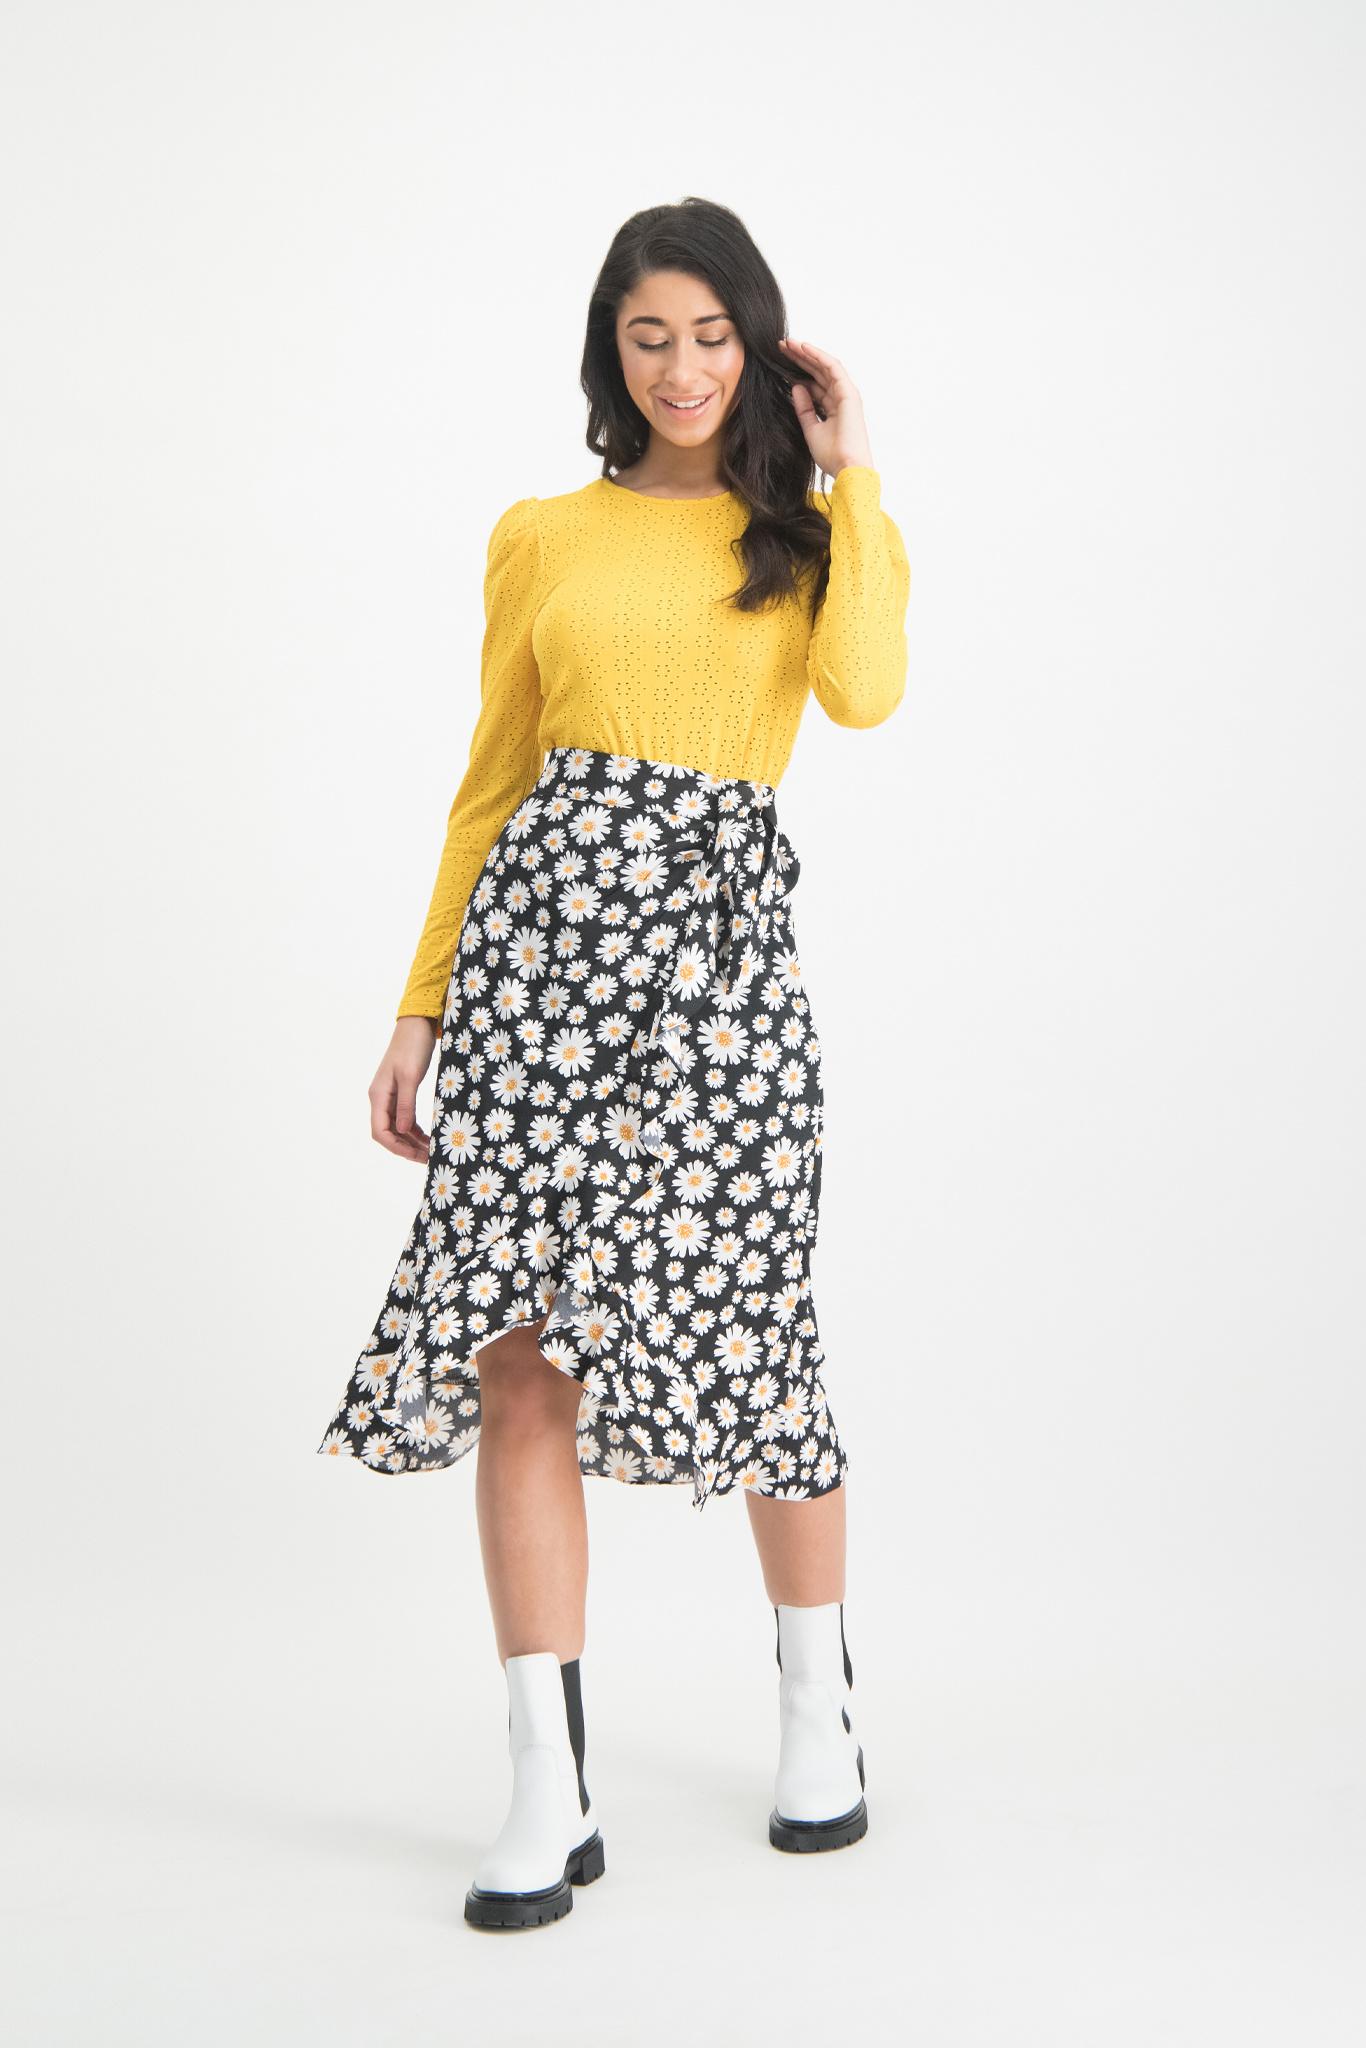 Lofty Manner Black Floral Print Skirt Lorelai